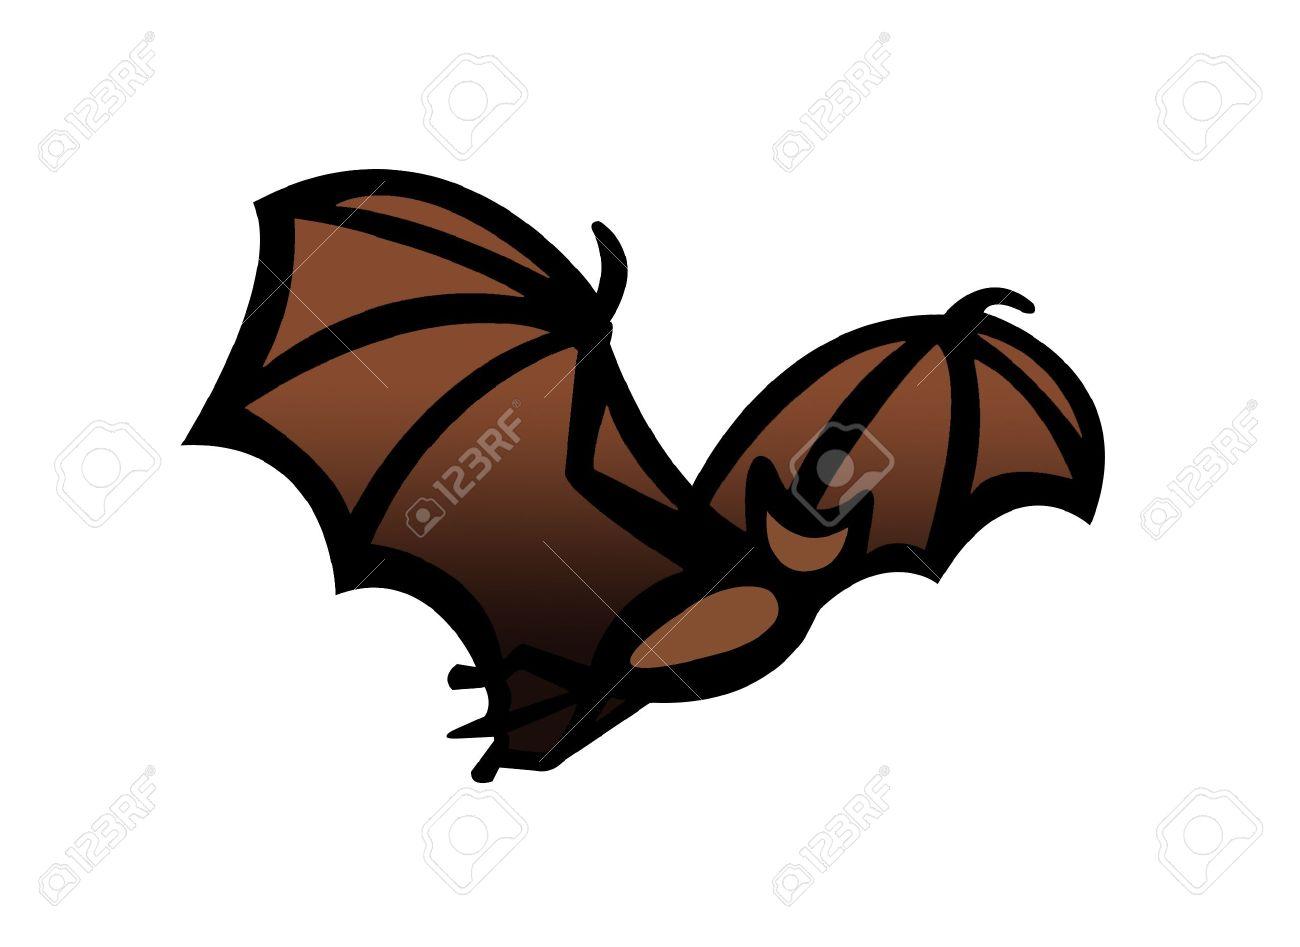 hight resolution of simple drawing illustration clipart of a bat in flight great halloween symbol stock illustration